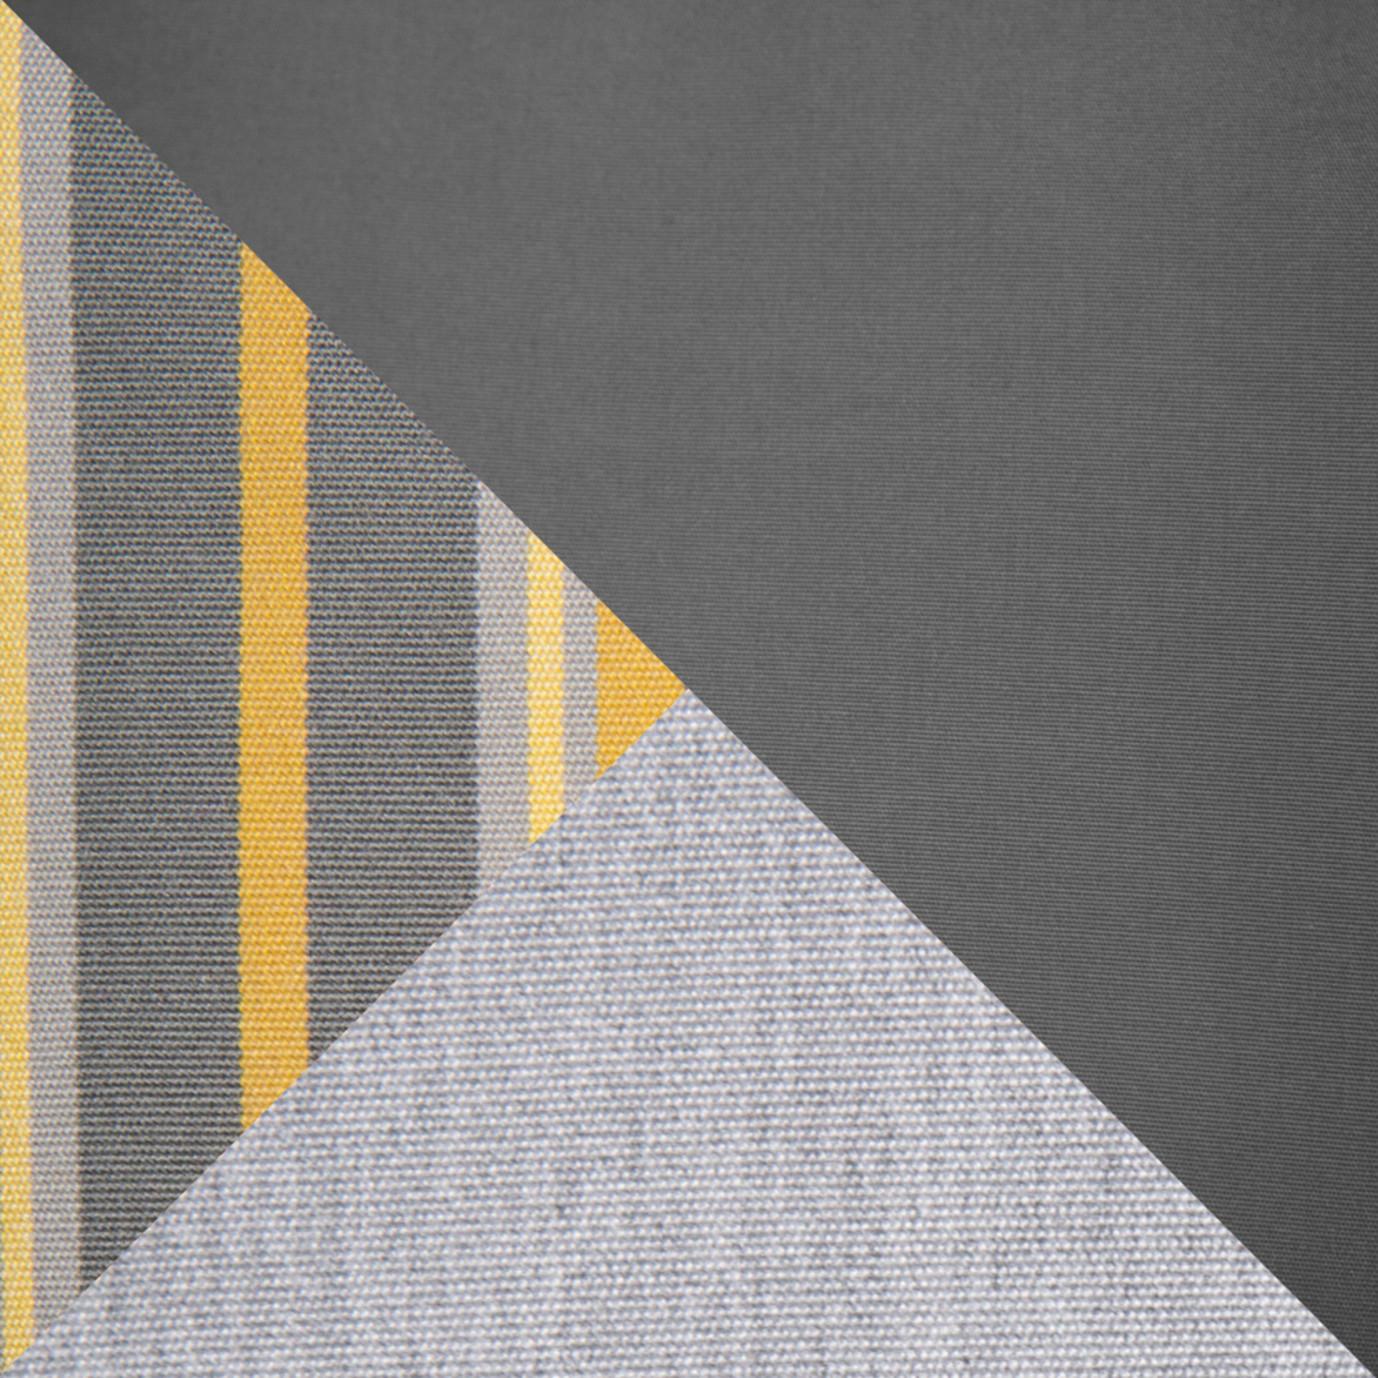 Barcelo™ 5pc Motion Club & Ottoman Set - Charcoal Gray